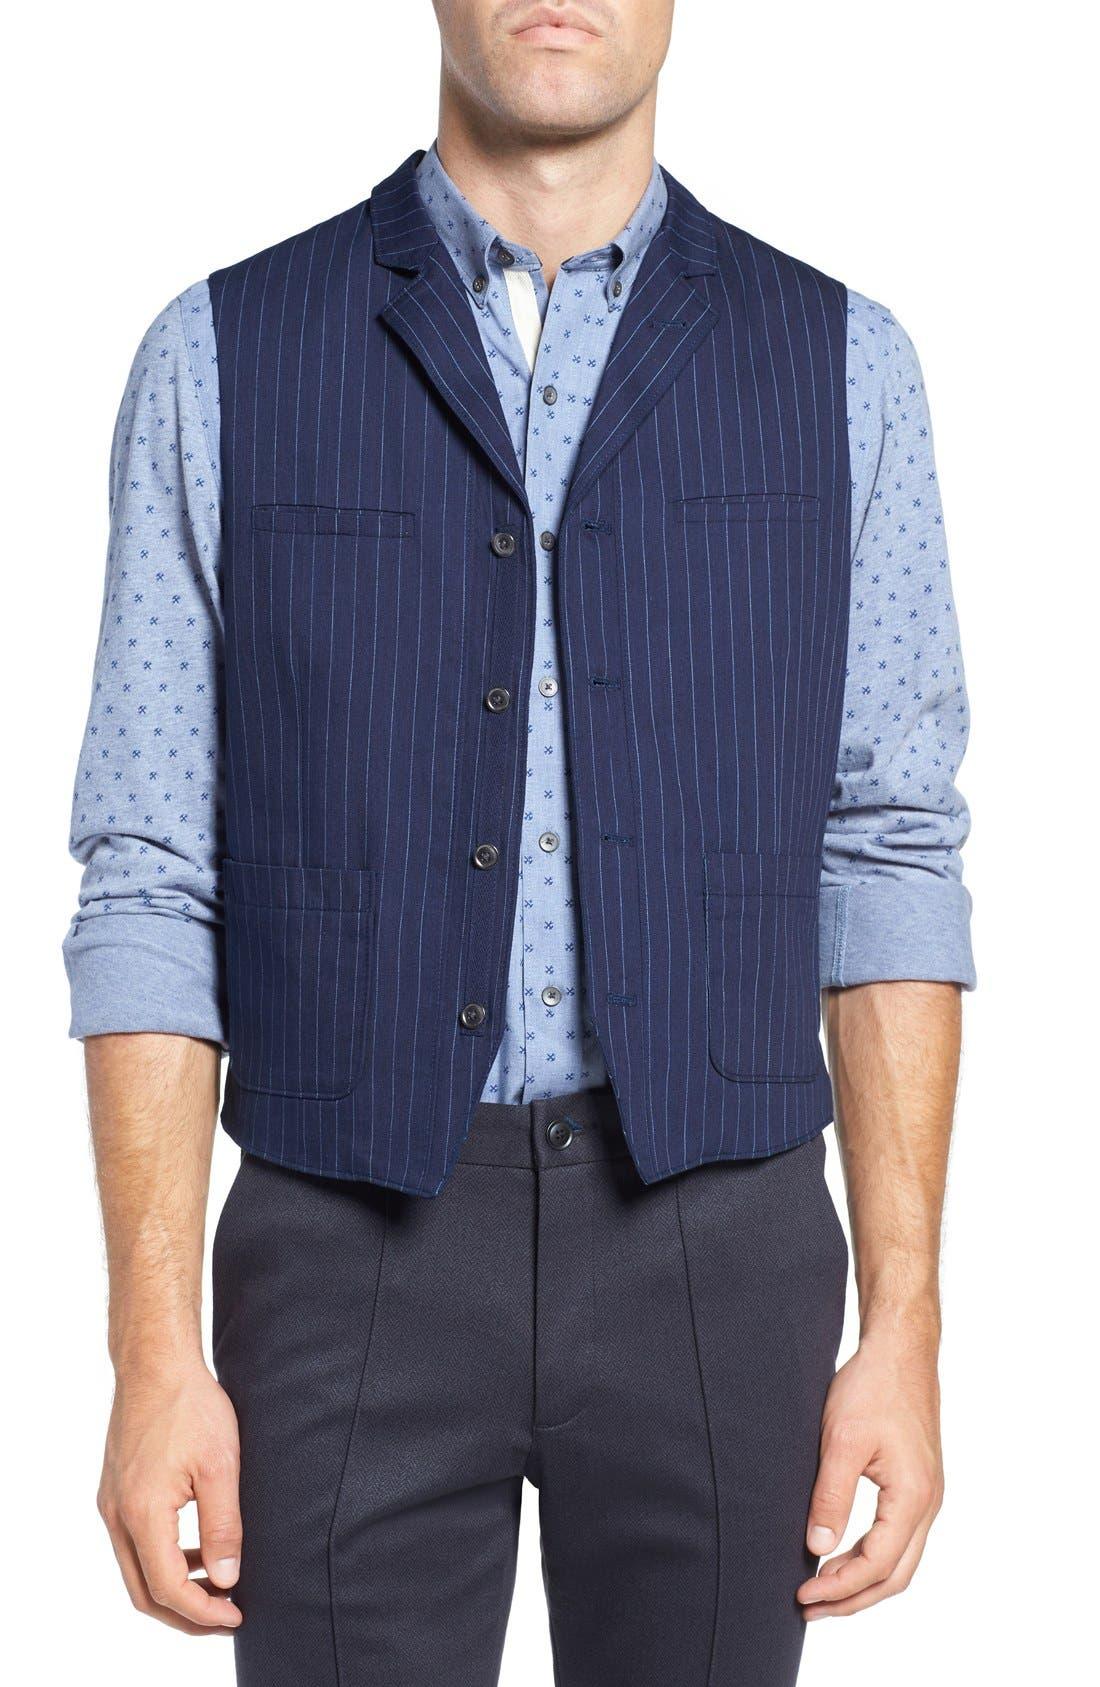 Windsor Pinstripe Cotton Twill Vest,                             Main thumbnail 1, color,                             410